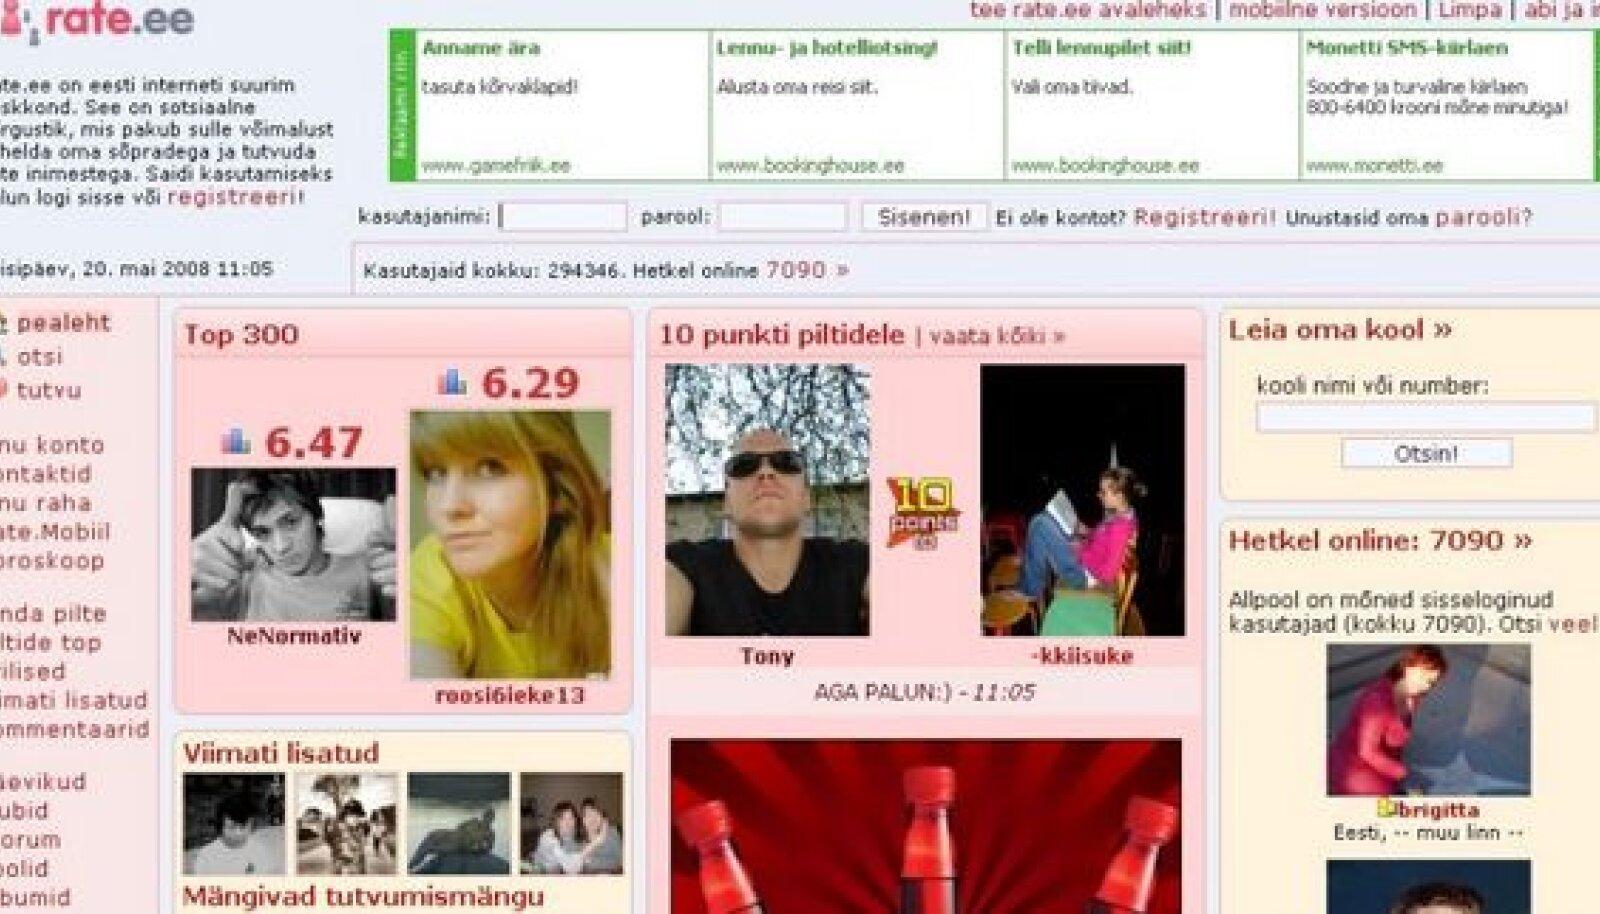 Meeldib.ee site ranking history